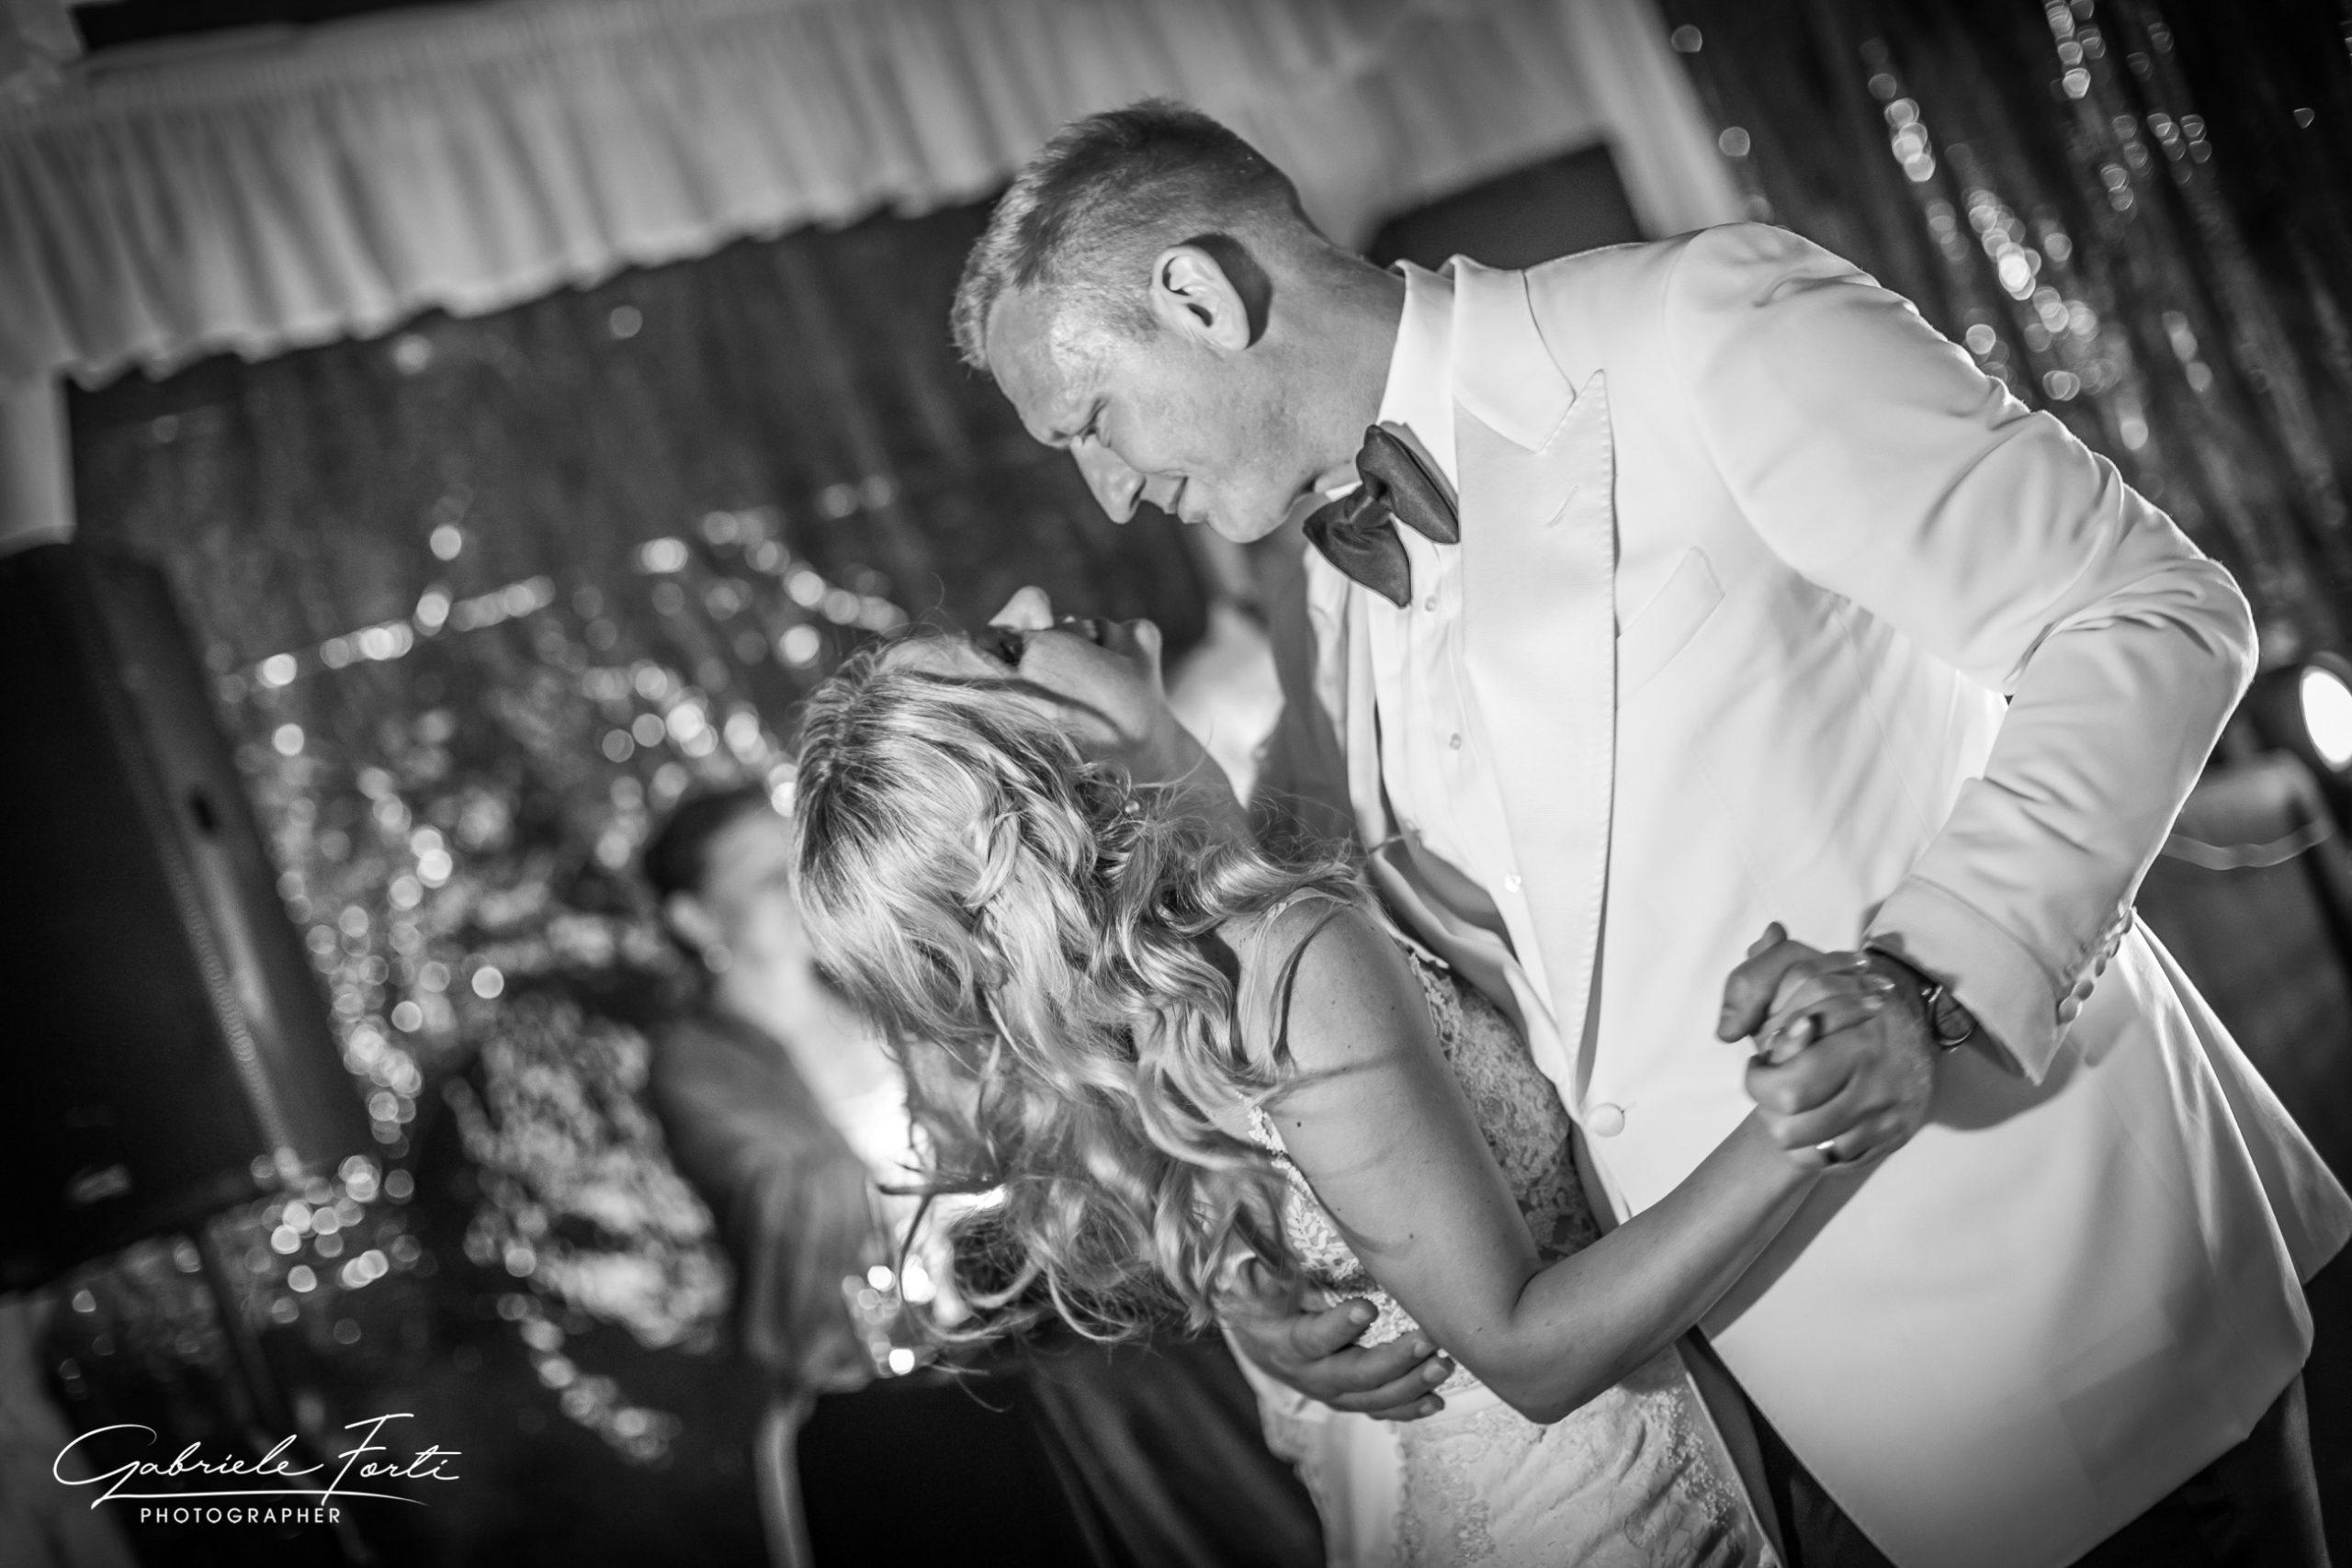 wedding-cortona-tuscany-italy-photographer-foto-forti-gabriele-villa-laura-12